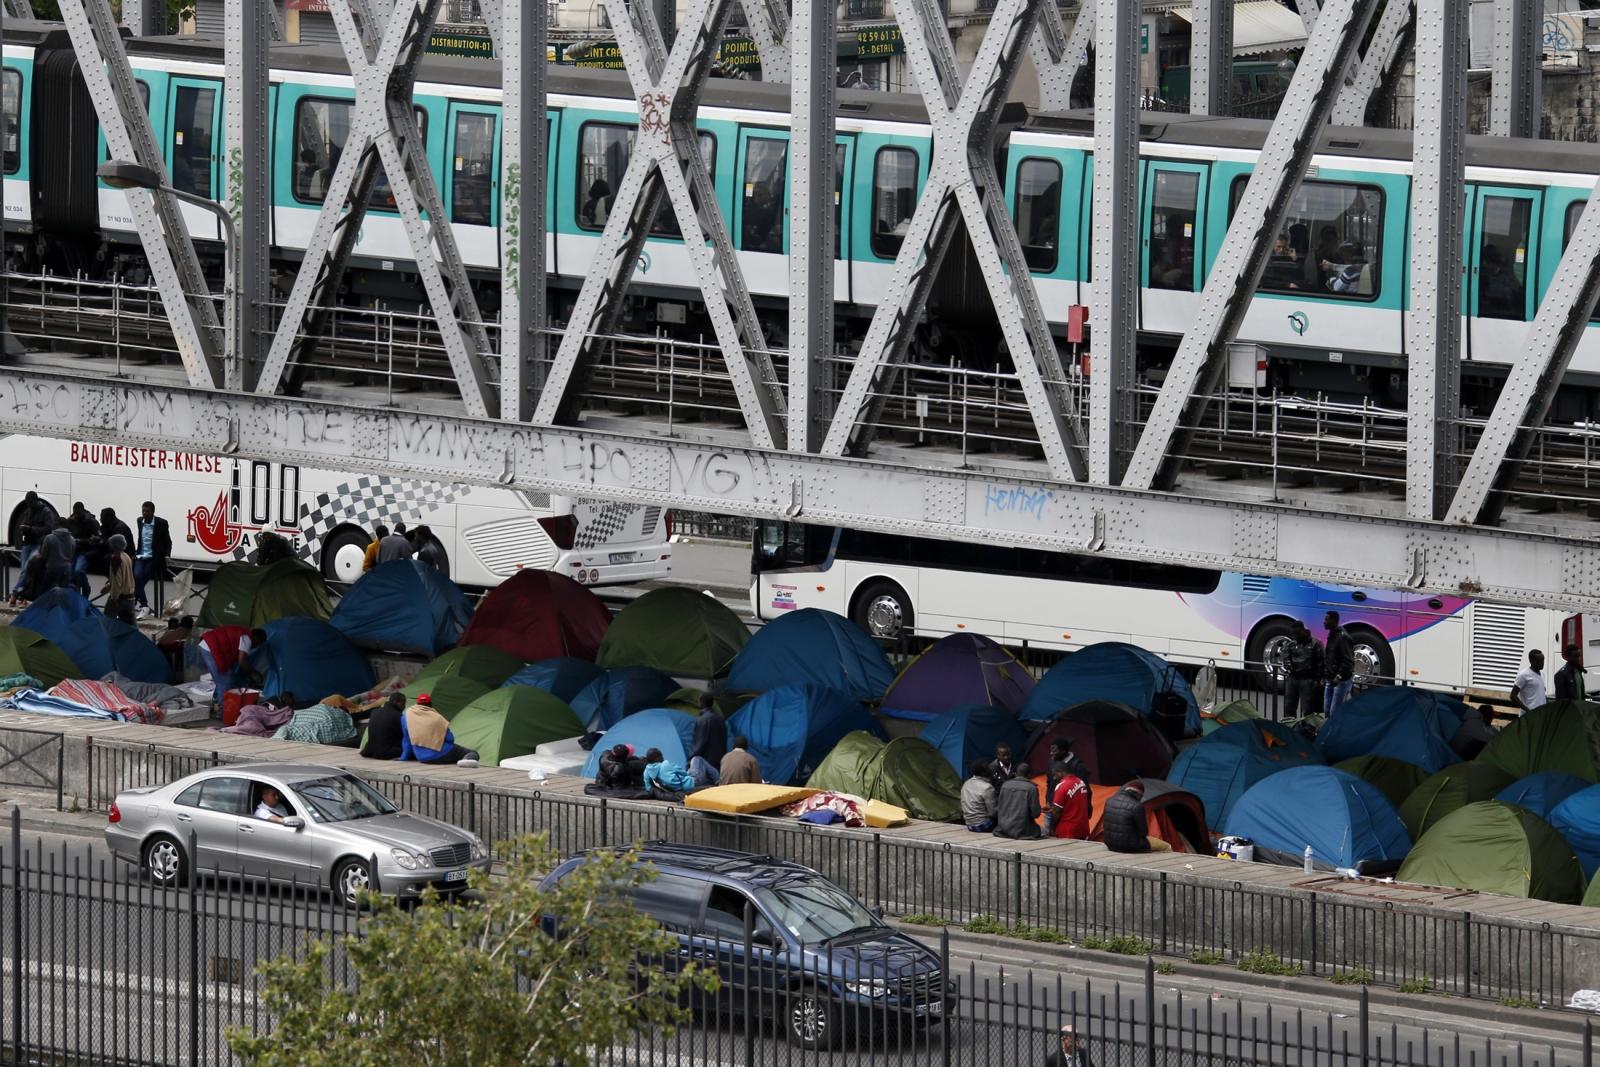 Migrants camp in Calais